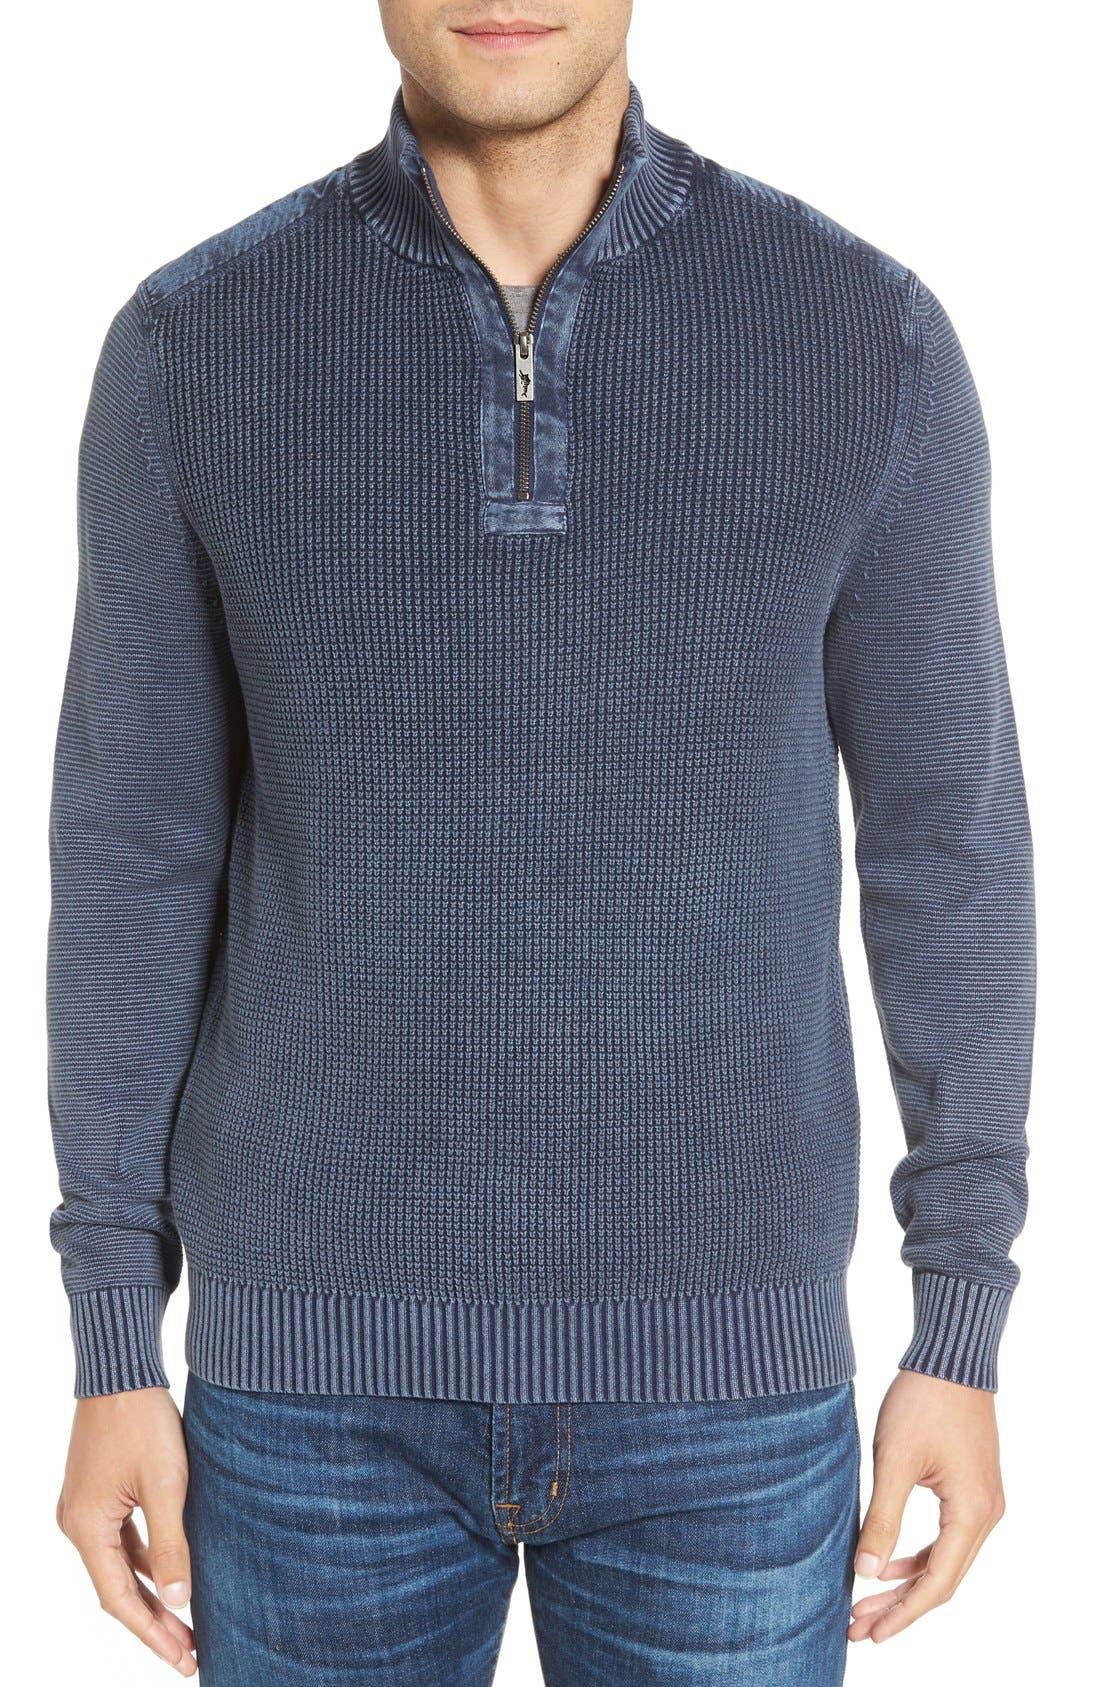 Coastal Shores Quarter Zip Sweater,                             Main thumbnail 5, color,